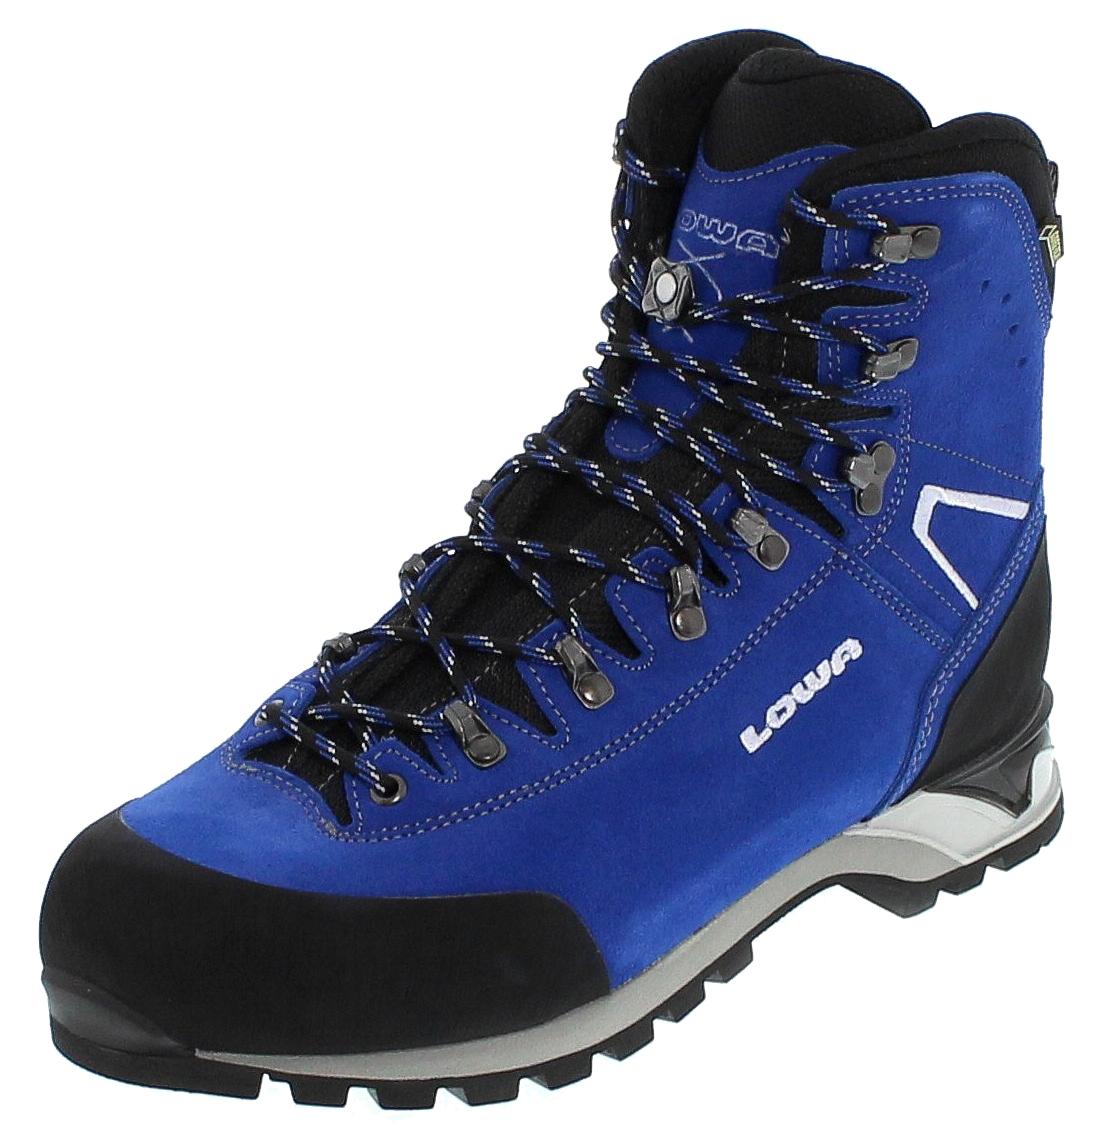 Lowa PREDAZZO GTX Blau Grau Herren Trekking Schuhe